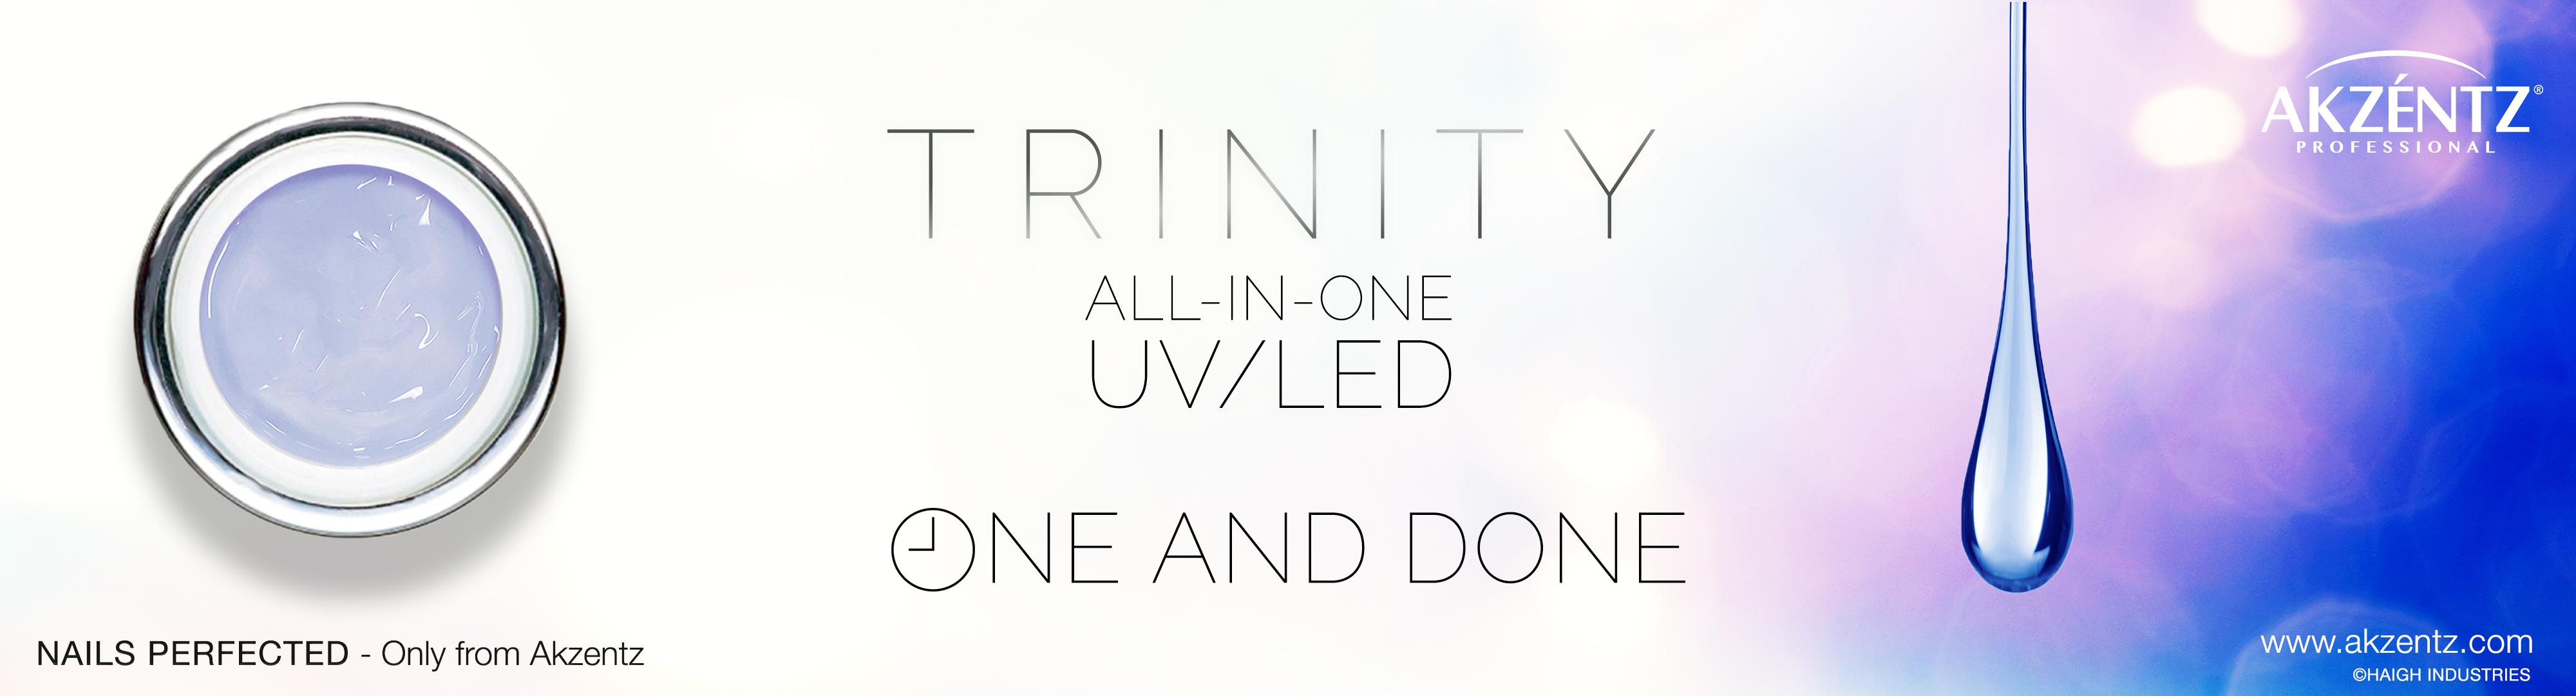 trinity-web-banner-2.jpg